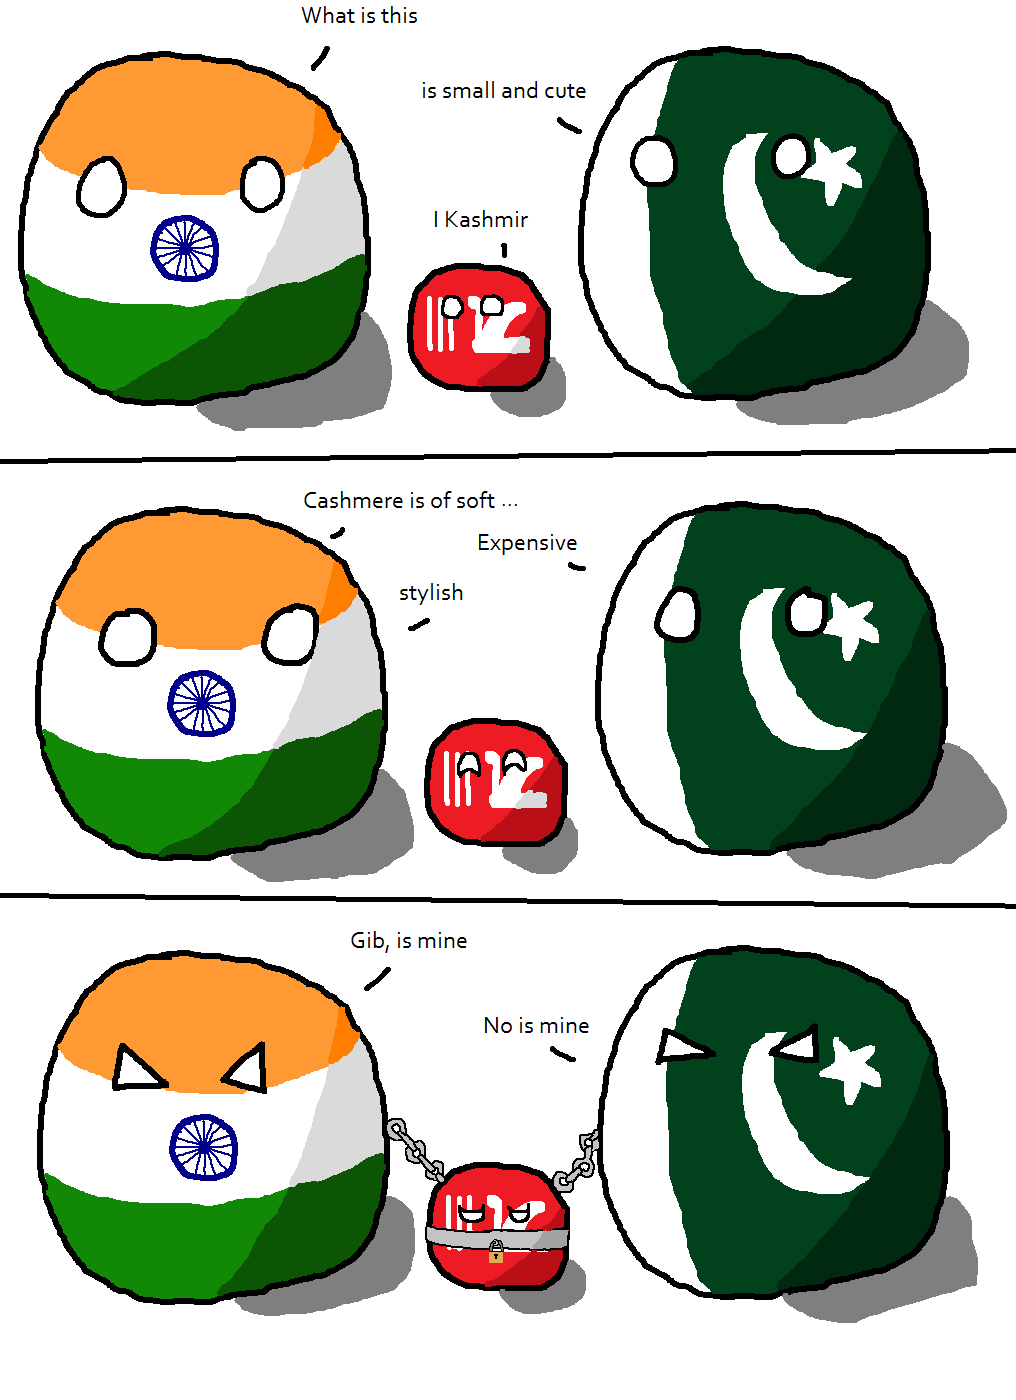 nostradamus on india and pakistan relationship